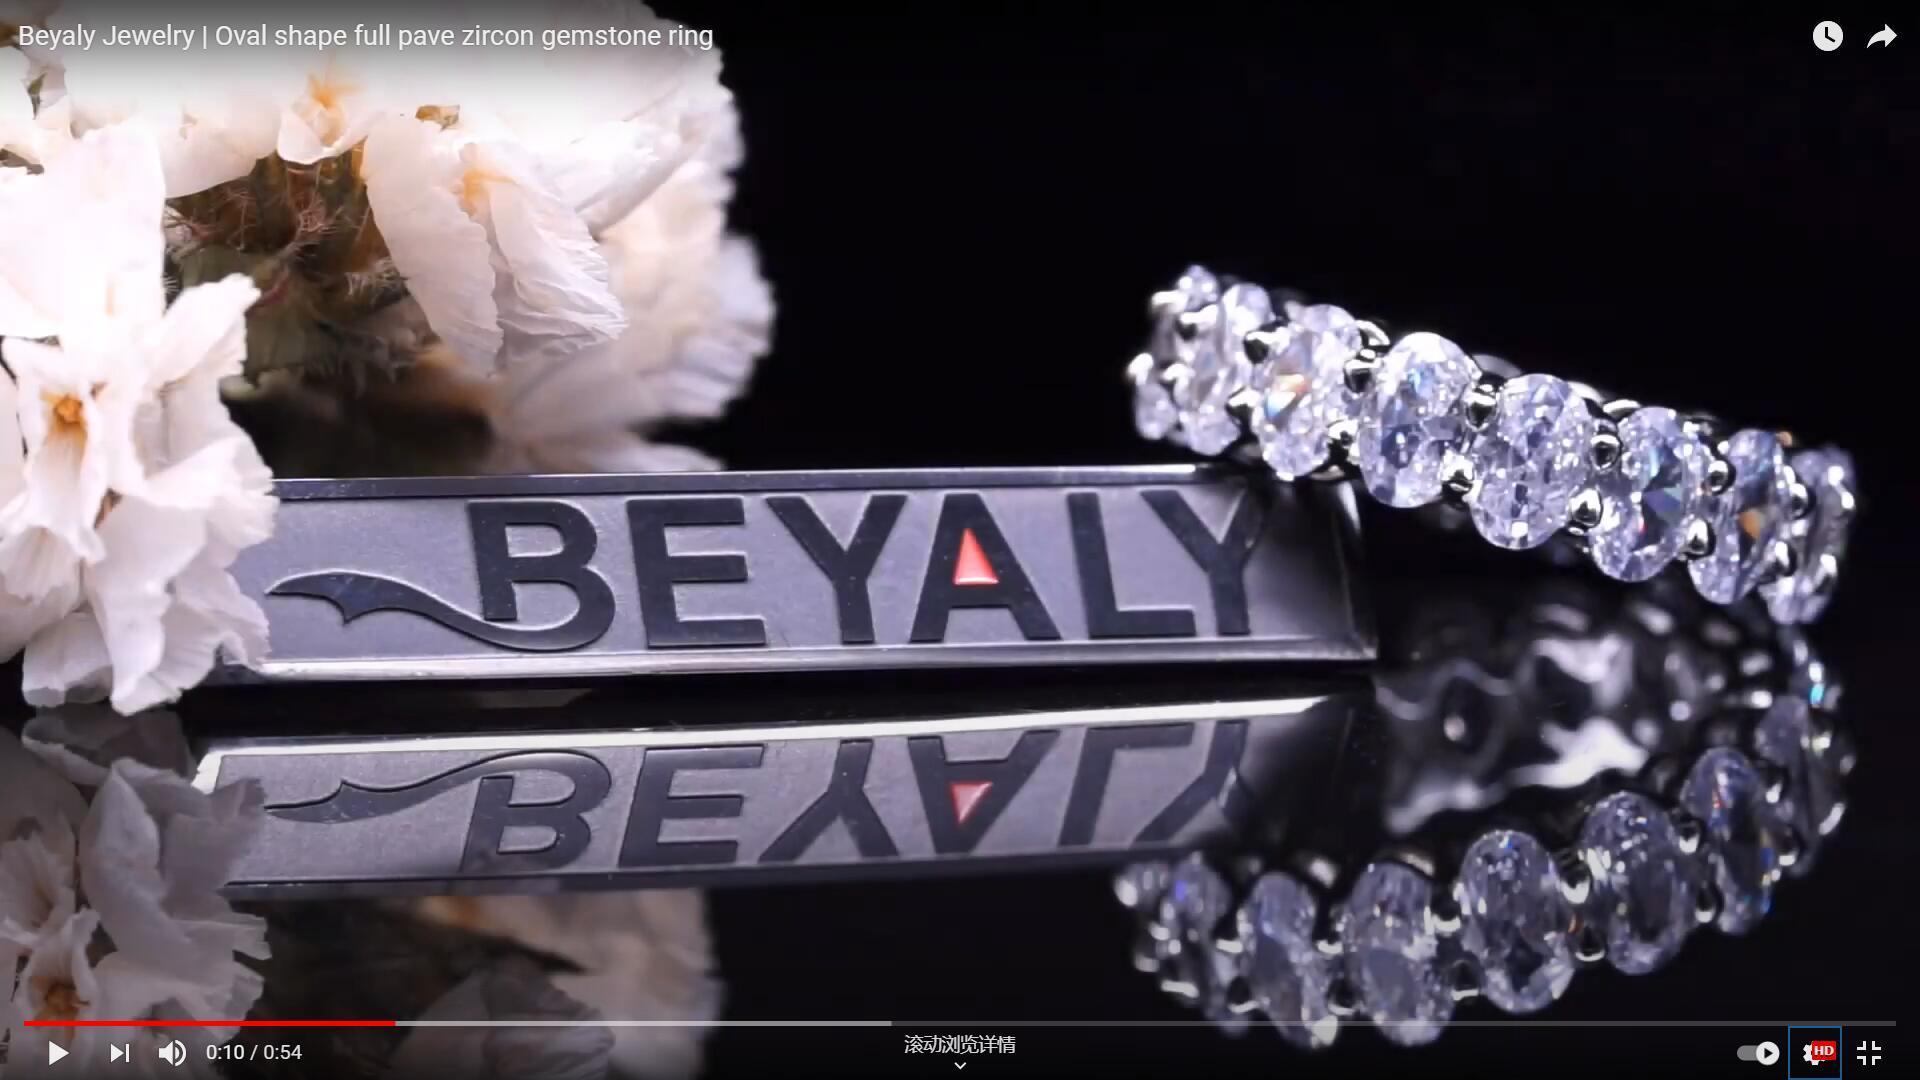 Beyaly Jewelry | Oval shape full pave zircon gemstone ring